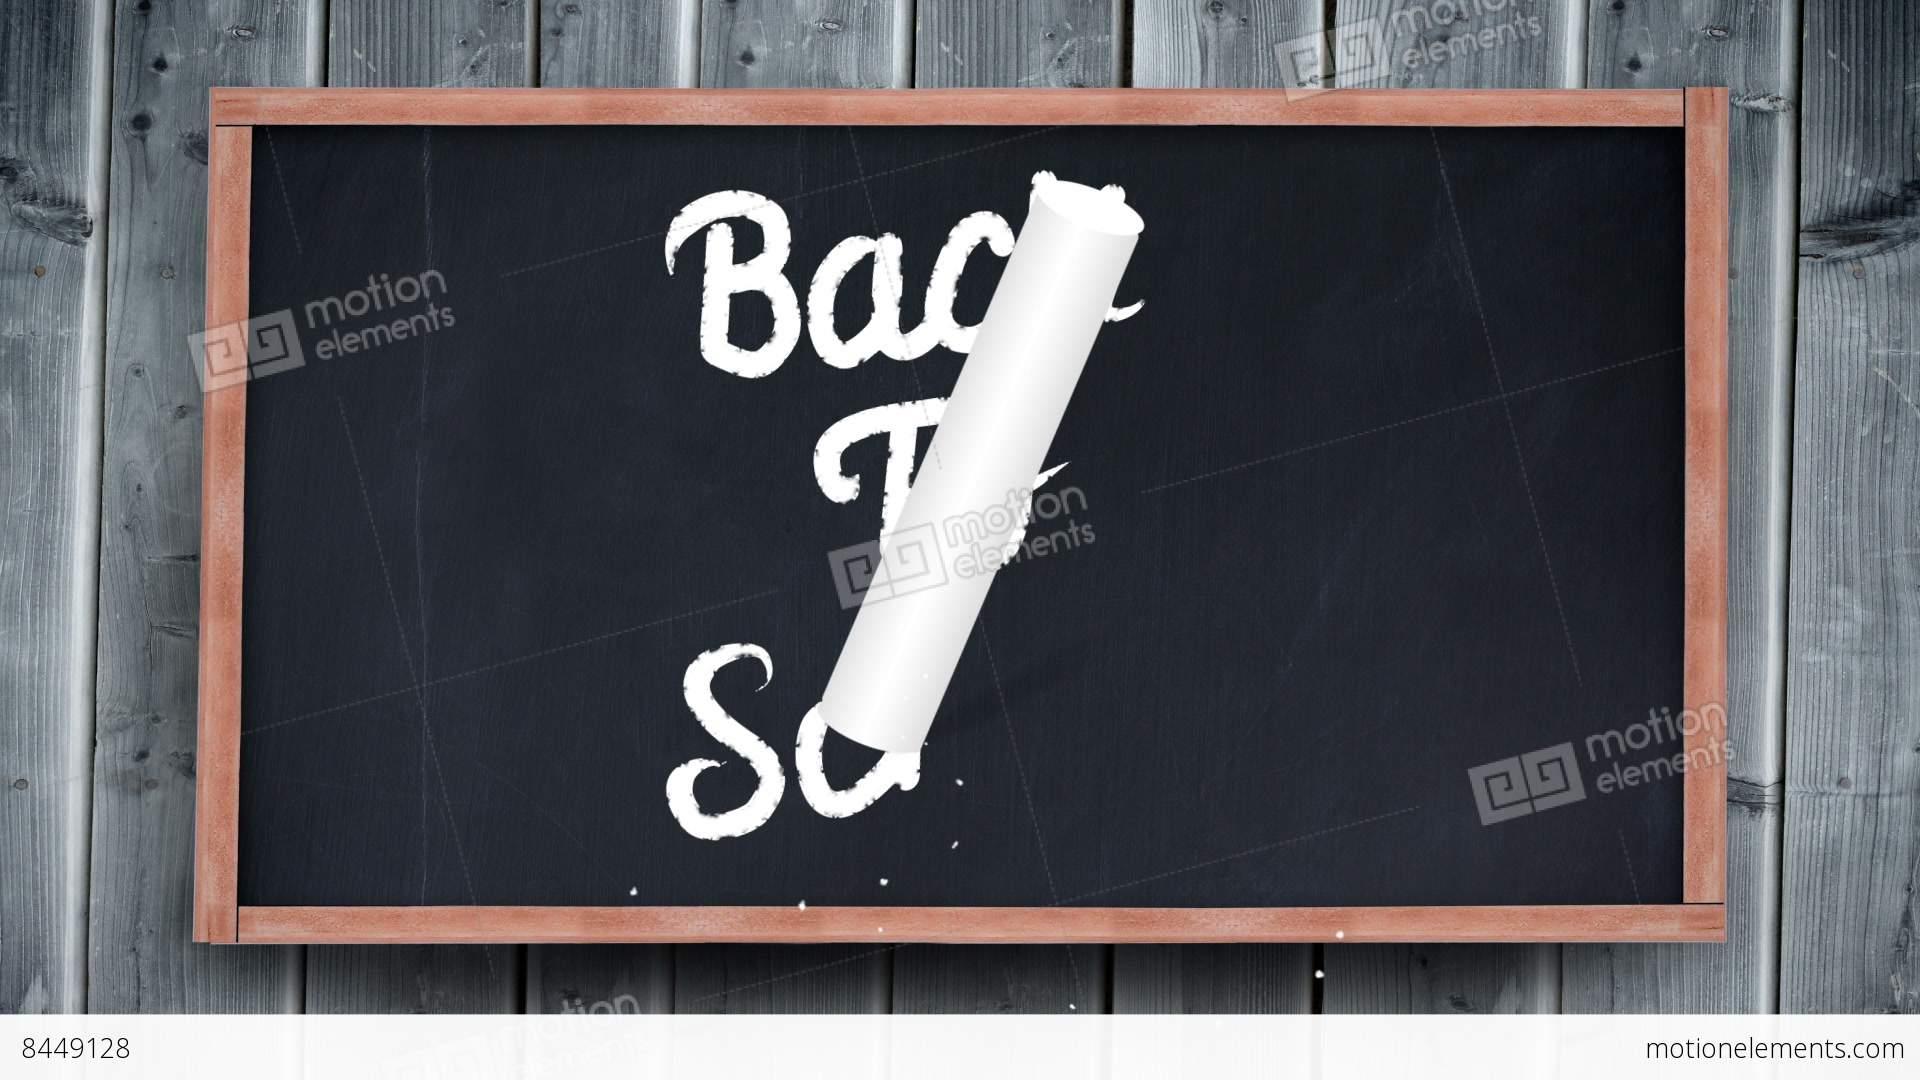 back to school writing on chalkboard stock animation  8449128